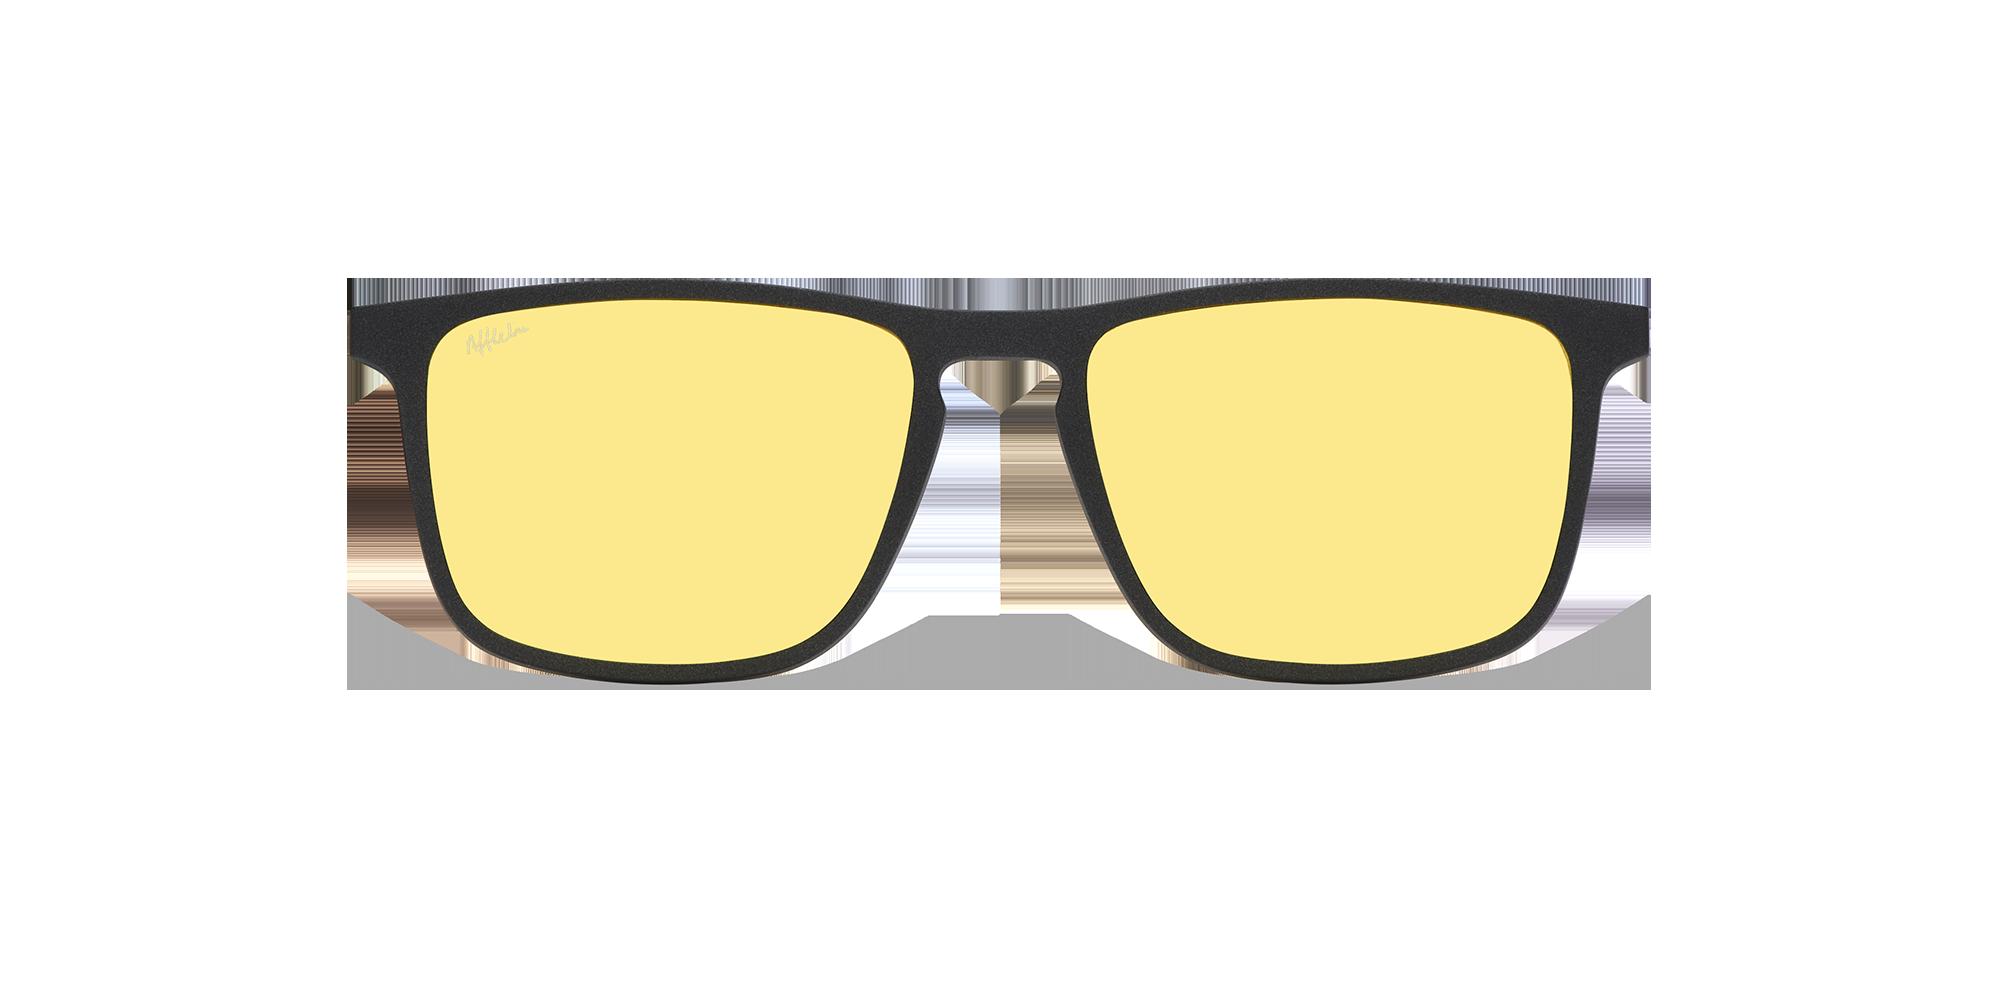 afflelou/france/products/smart_clip/clips_glasses/07630036428818_face.png